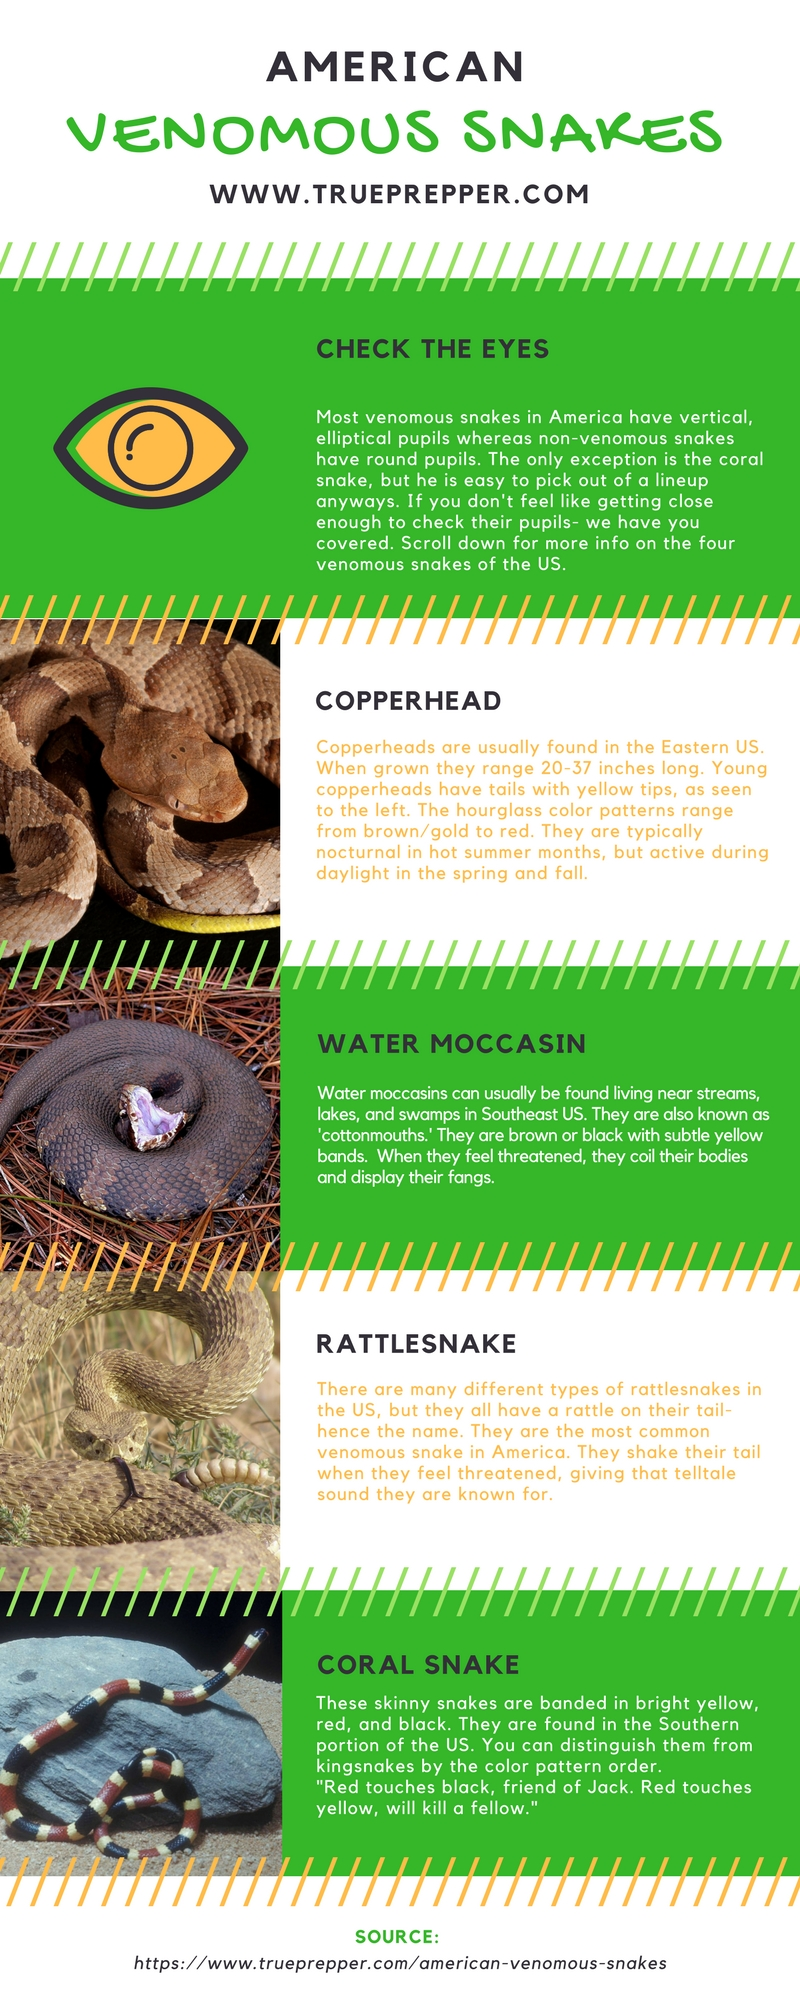 American Venomous Snakes Infographic